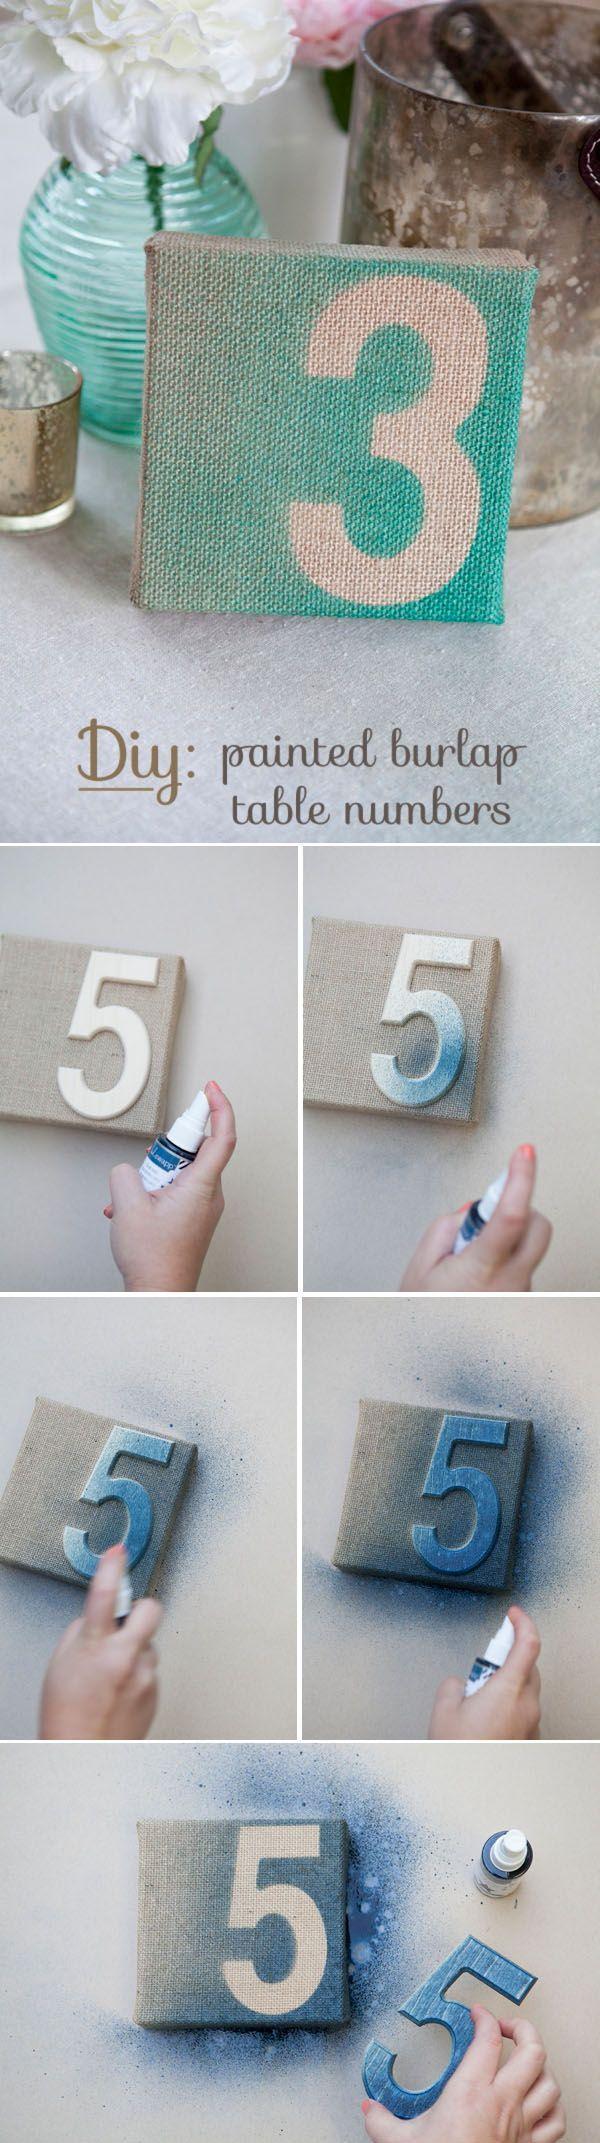 197 best Rustic wedding images on Pinterest | Bridal table, Weddings ...